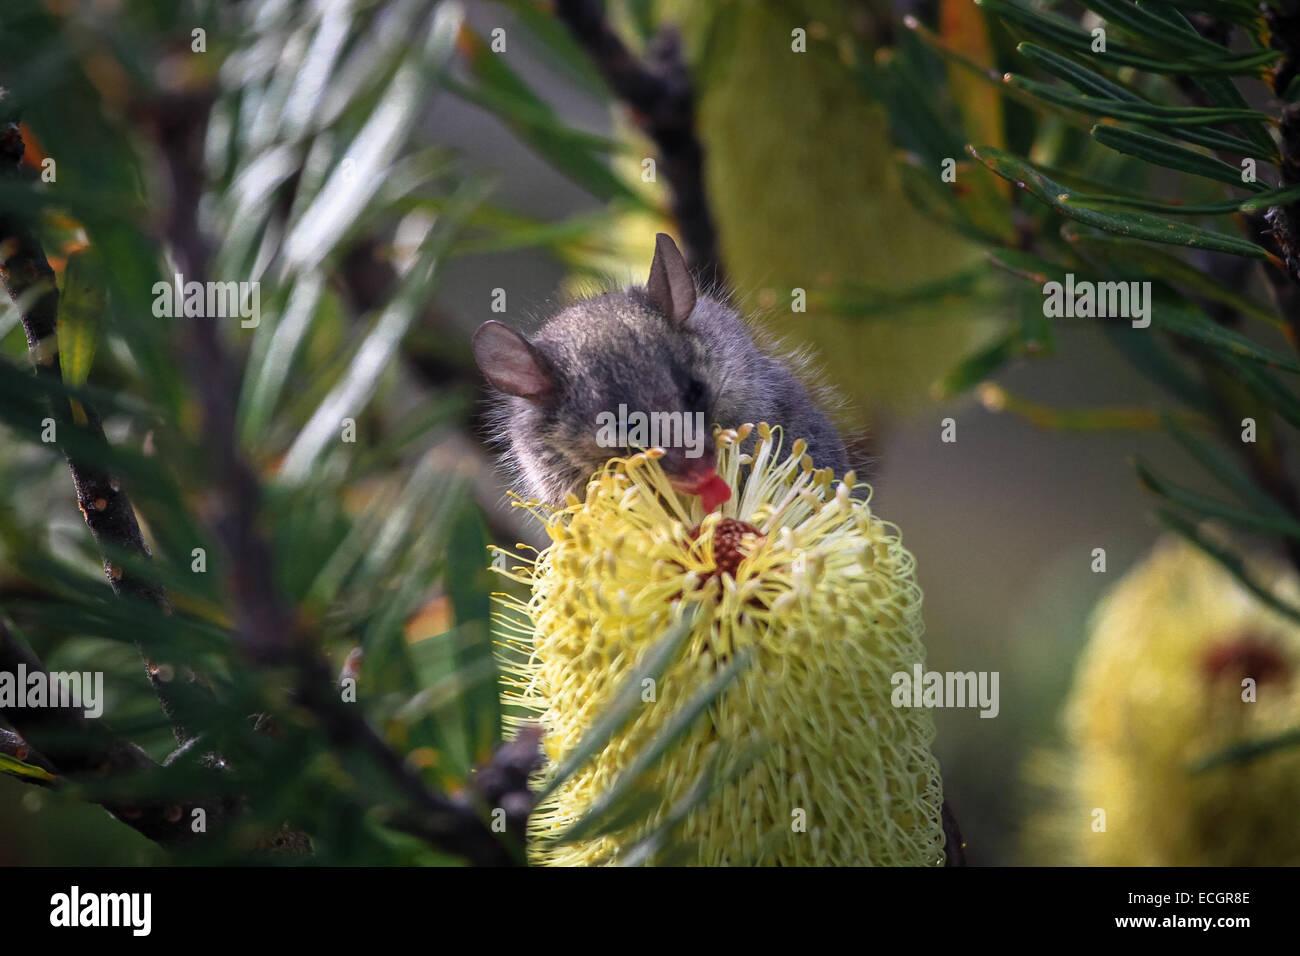 Mouse Licking Pollen on a Banksia cone, Tasmania - Stock Image